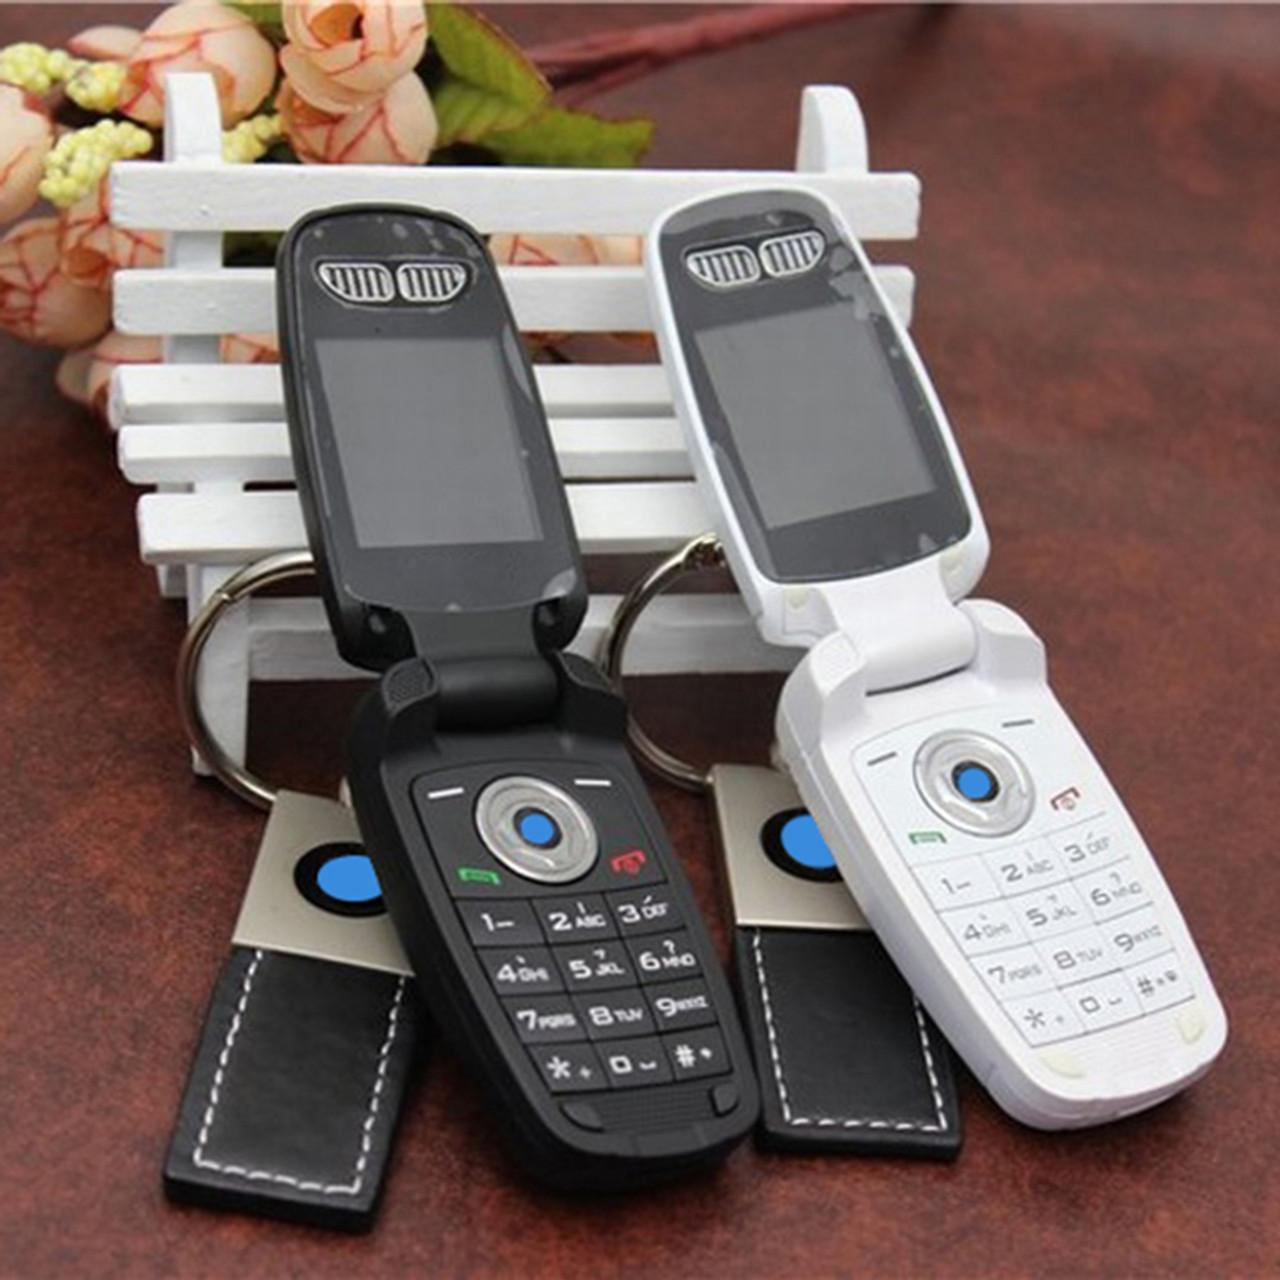 Unlock Car With Phone >> Mafam X6 Unlock Flip Russian Key Greek Single Sim Small Special Mini